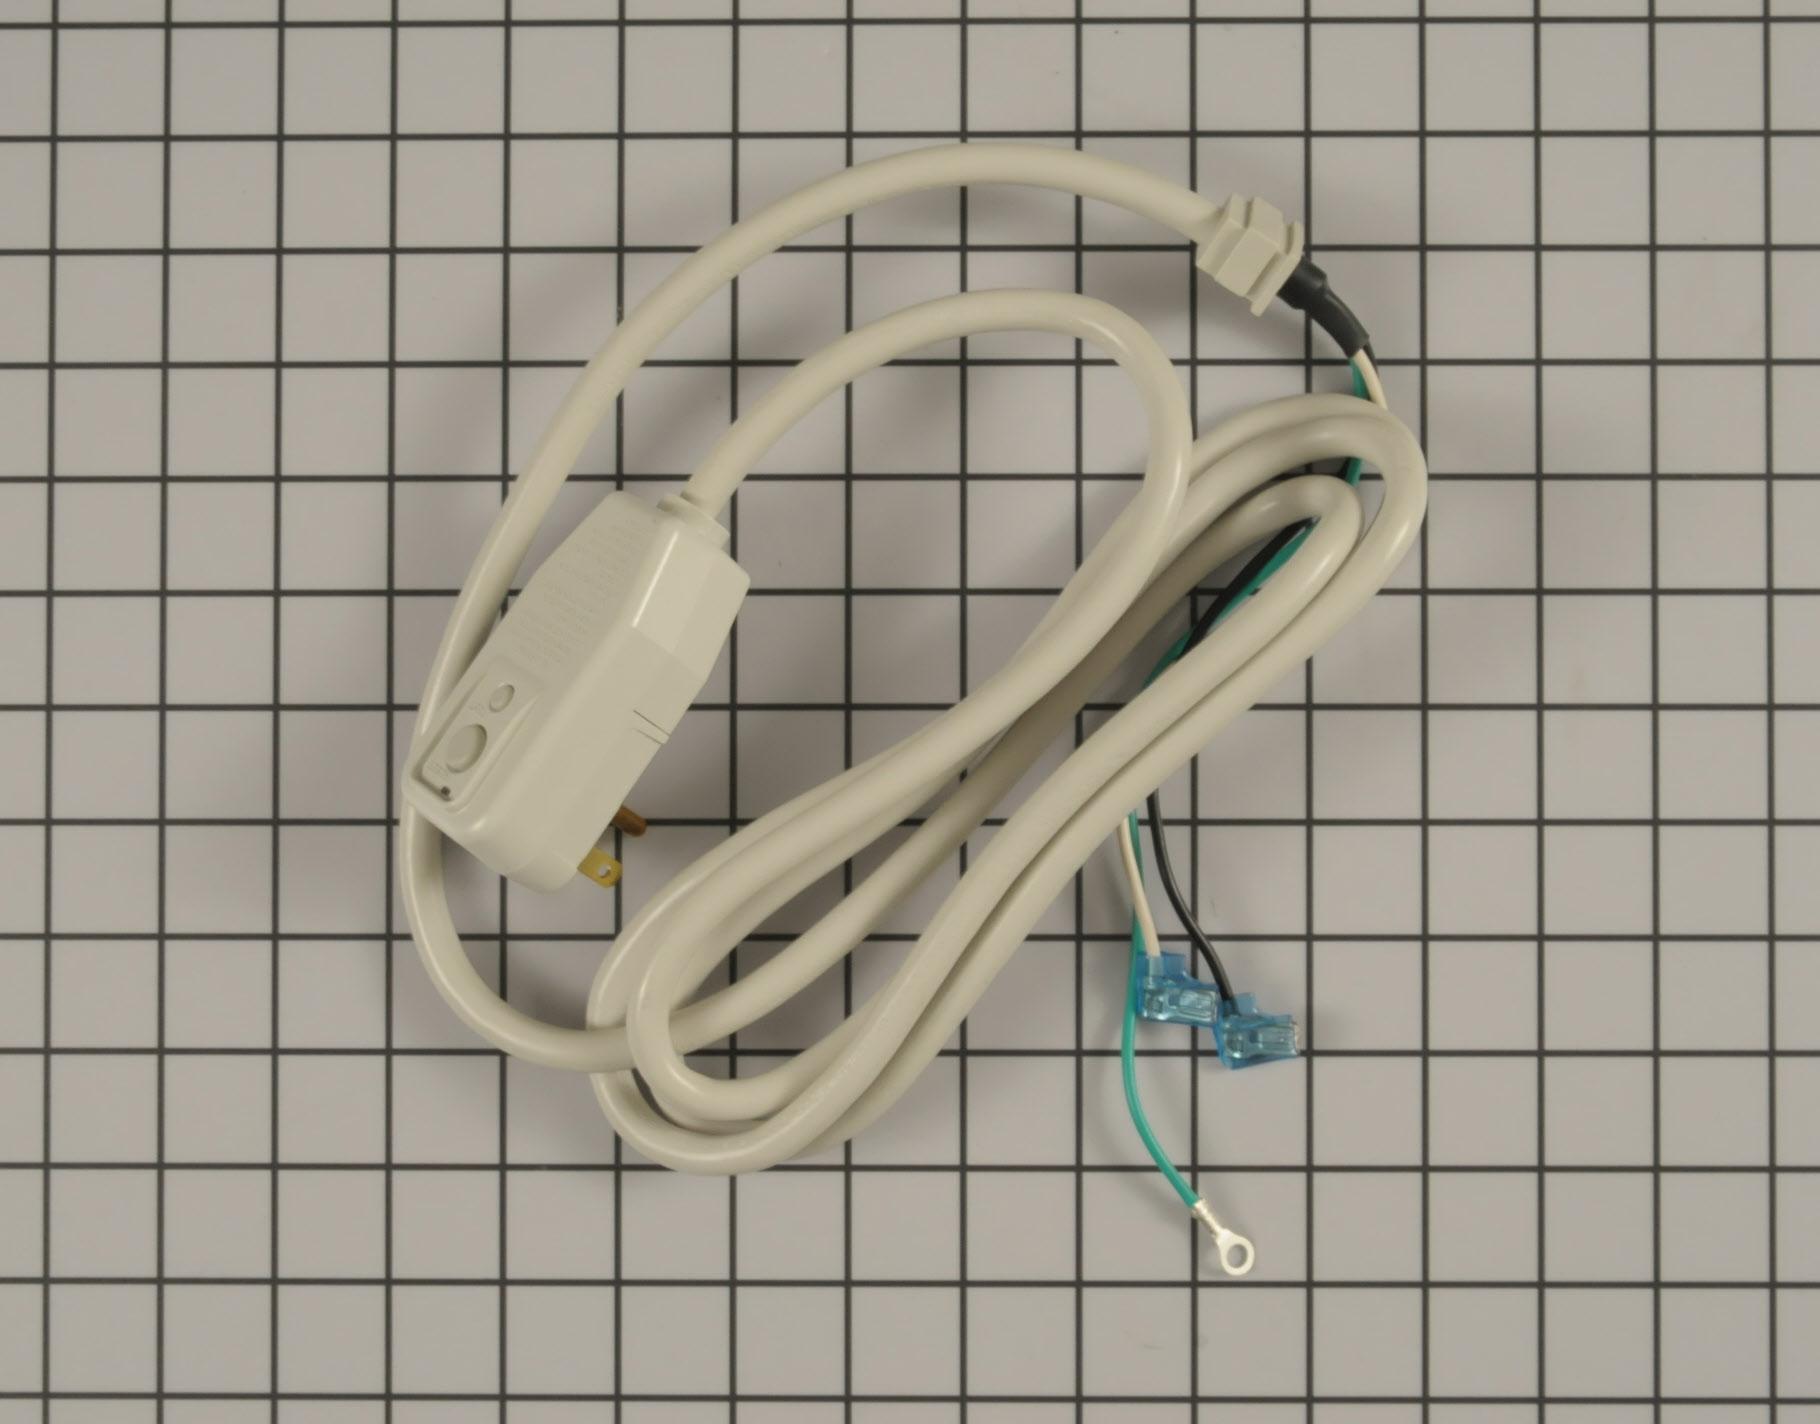 Friedrich Air Conditioner Part # EAD63469501 - Power Cord